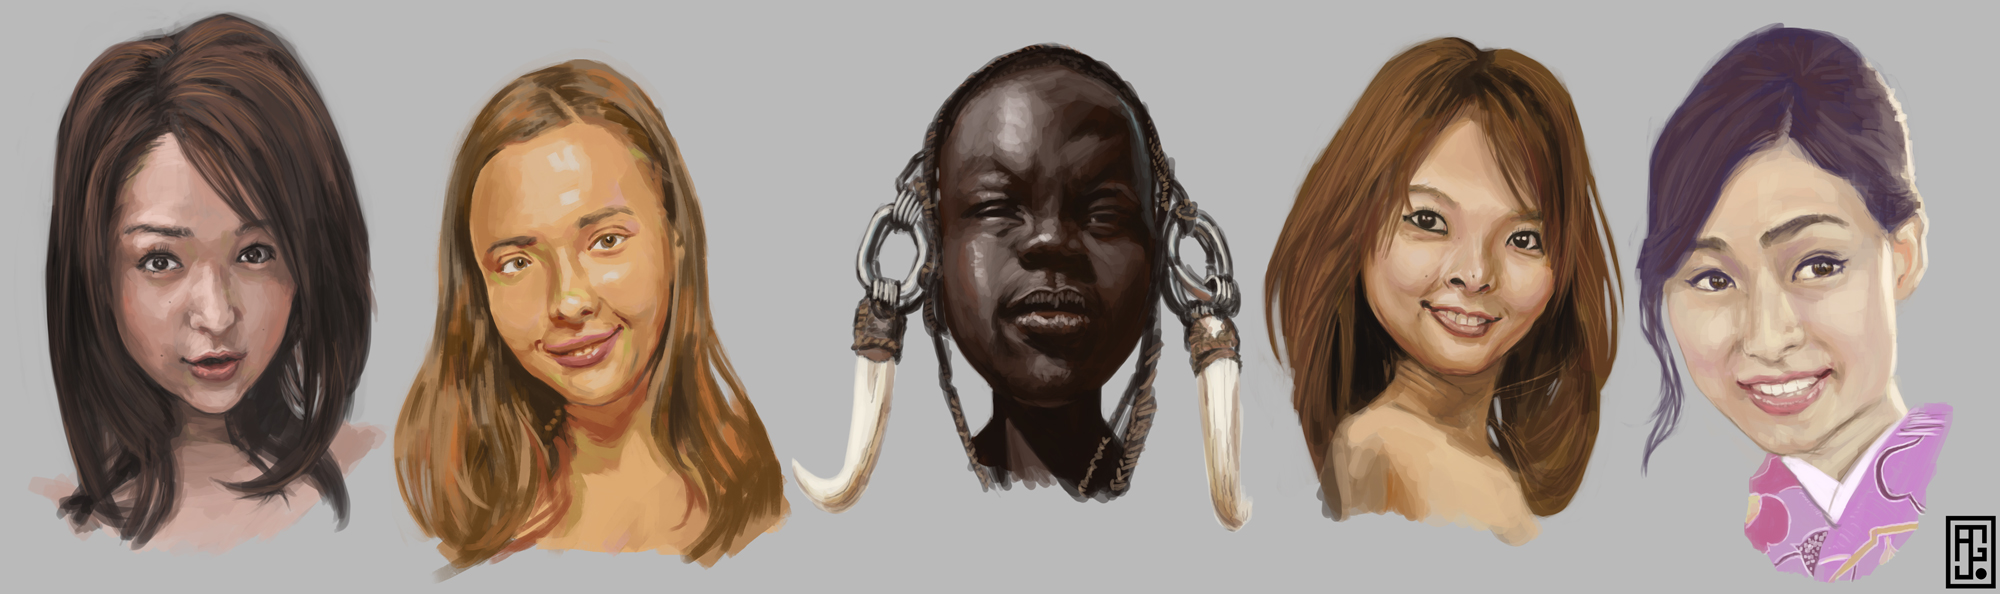 [Image: female_head_studies_by_xelfereht-d8gmxne.jpg]